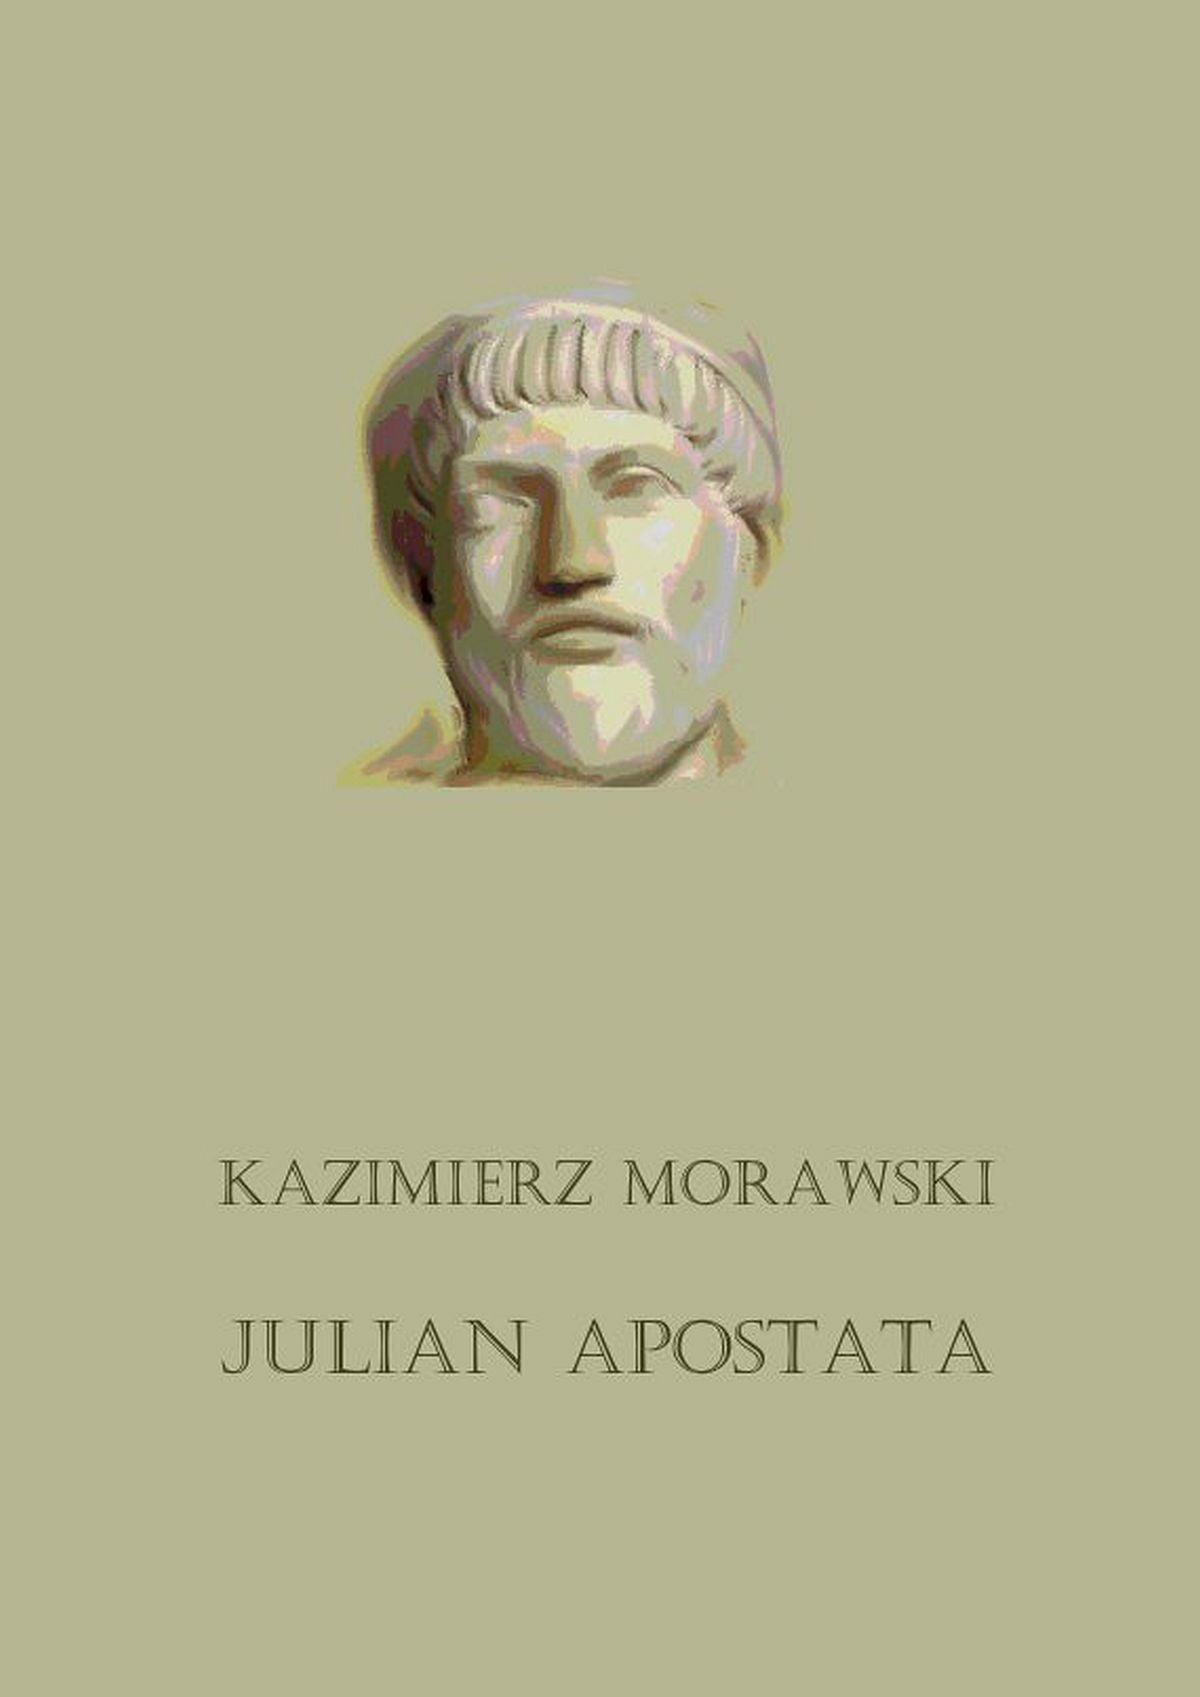 Julian Apostata